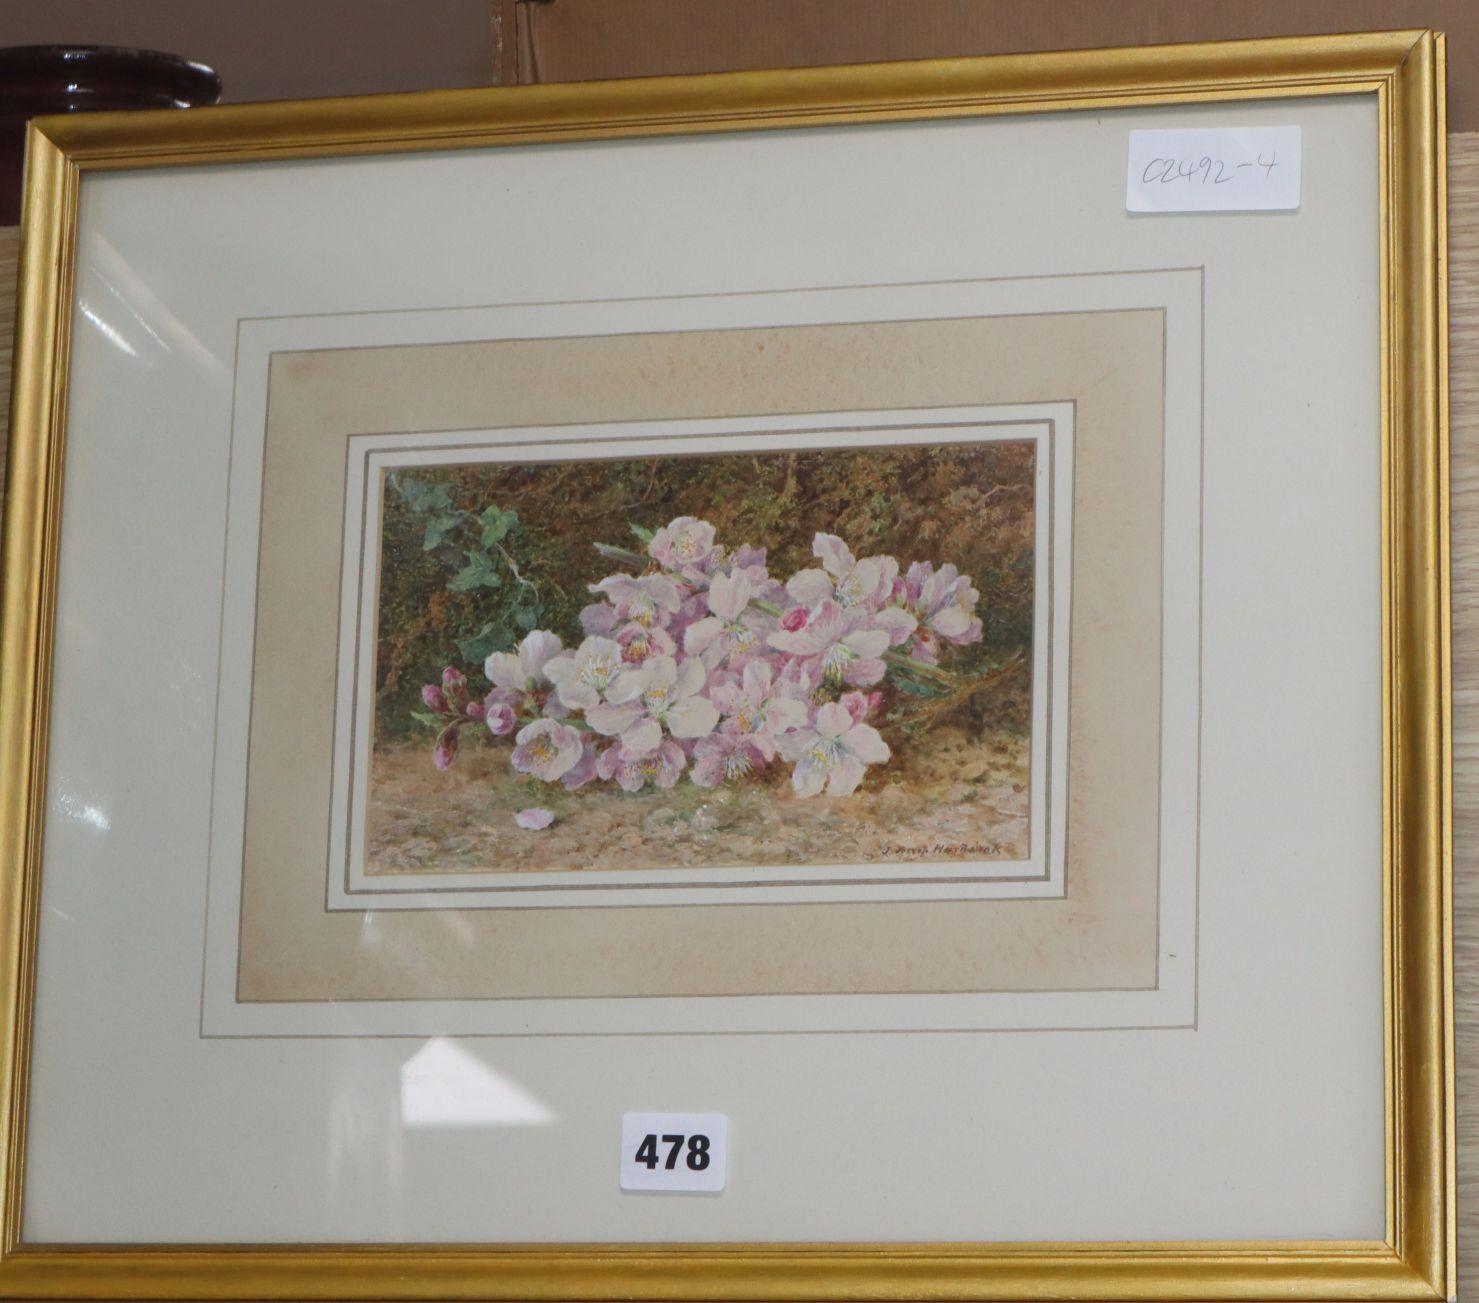 Lot 442 - John Jessop Hardwick (1831-1917), watercolour, Still life of Apple Blossom, signed, 12 x 20cm